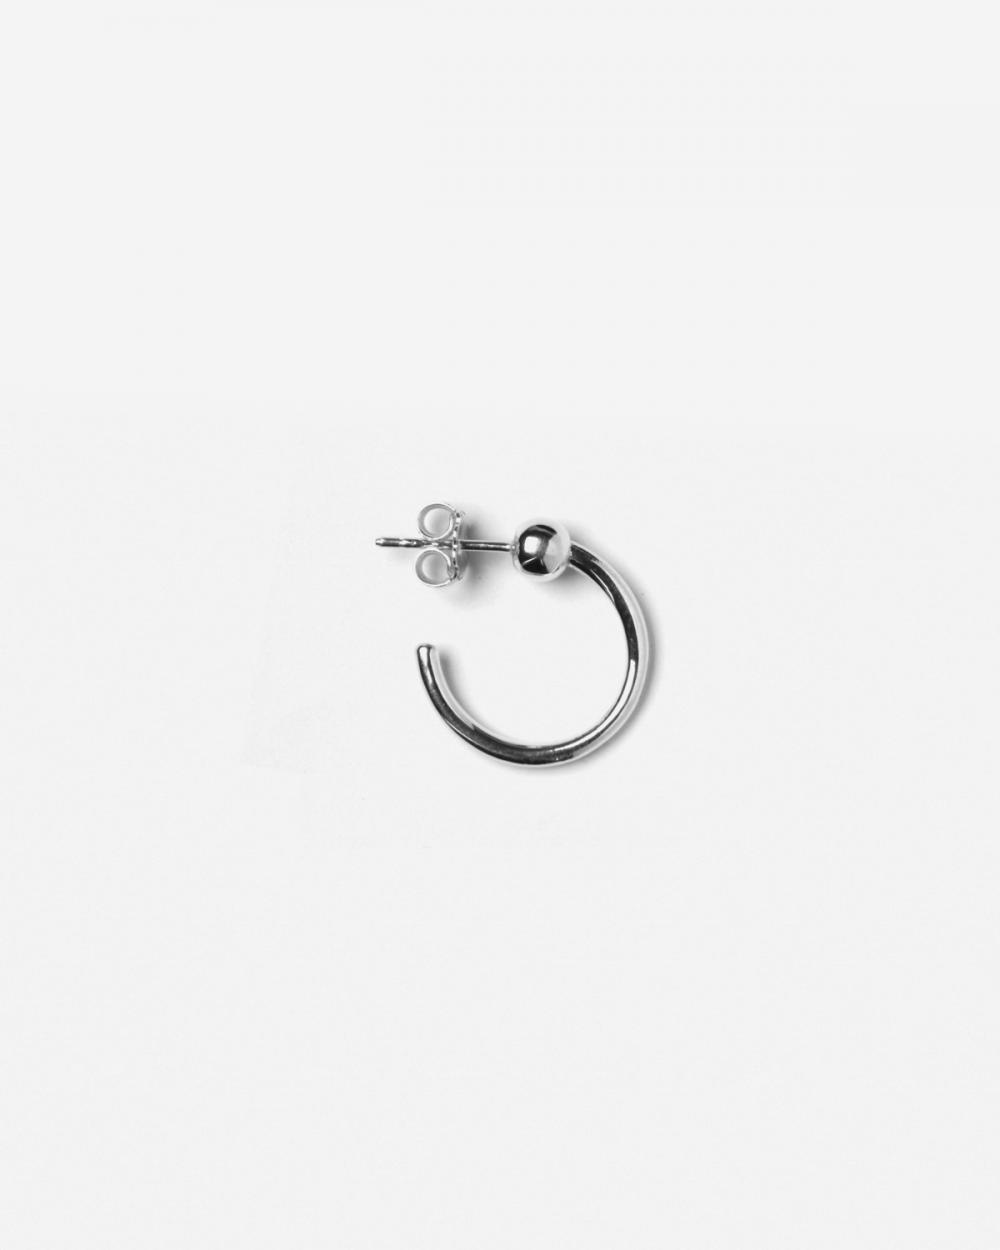 Earrings SILVER ALPHA SINGLE EARRING NOVE25